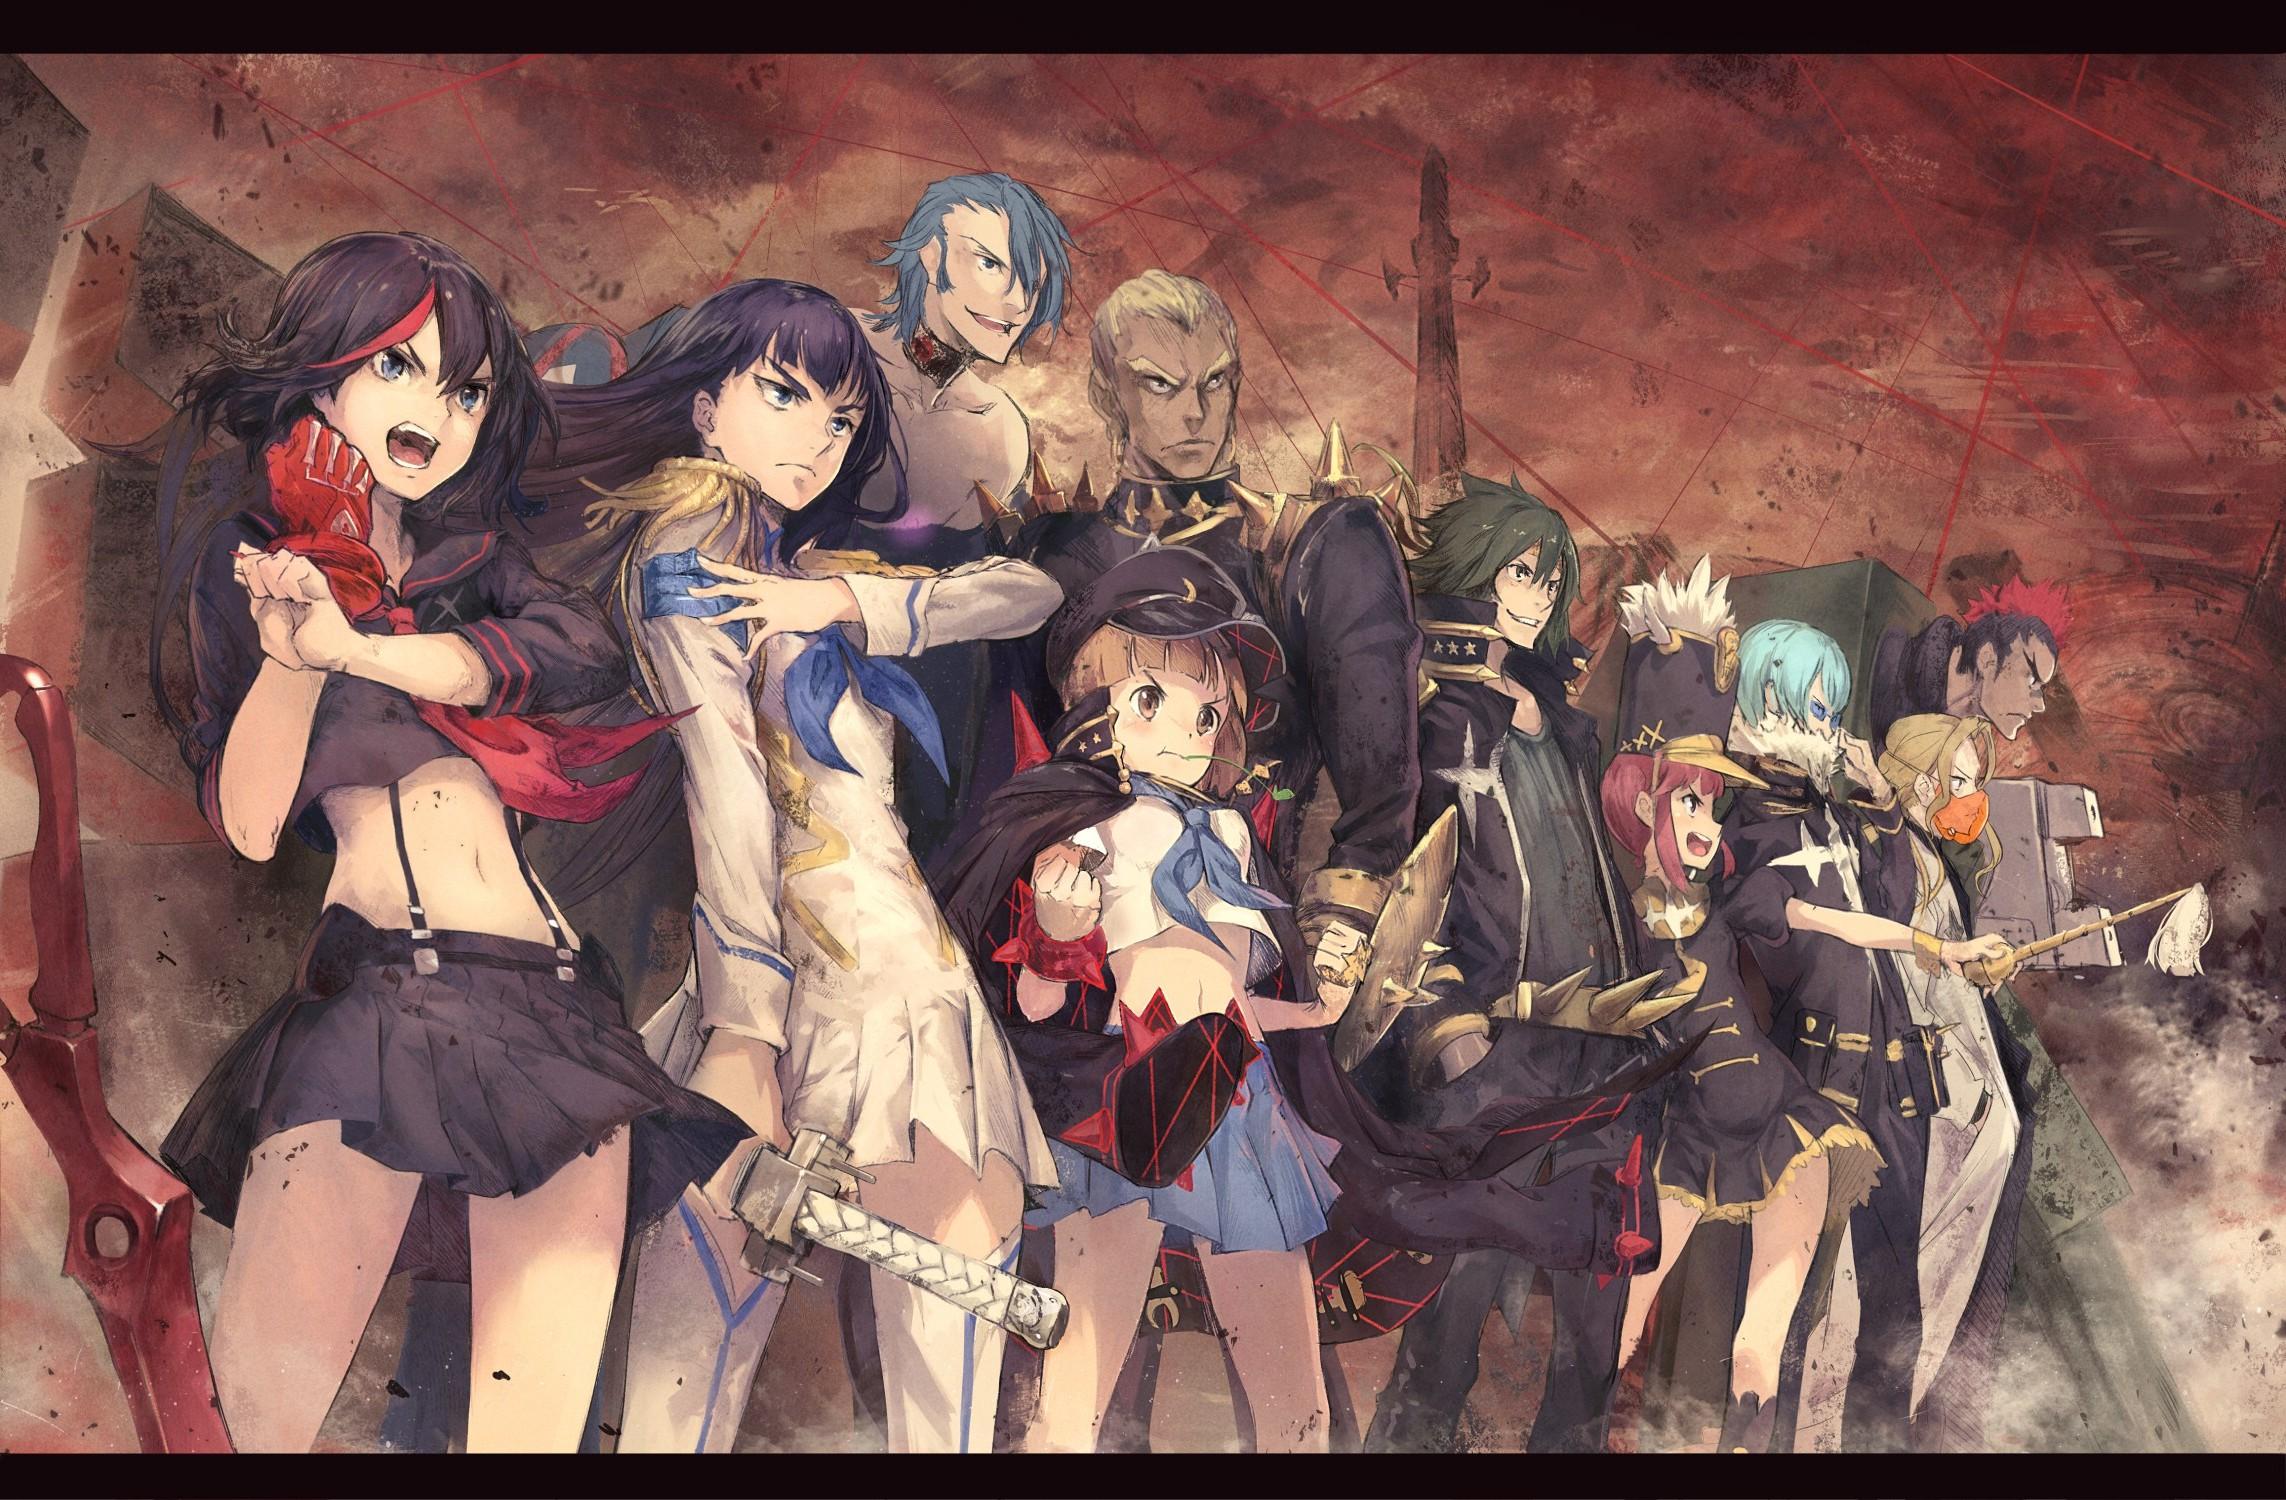 Anime Characters For Gmod : Wallpaper anime jakuzure nonon kill la matoi